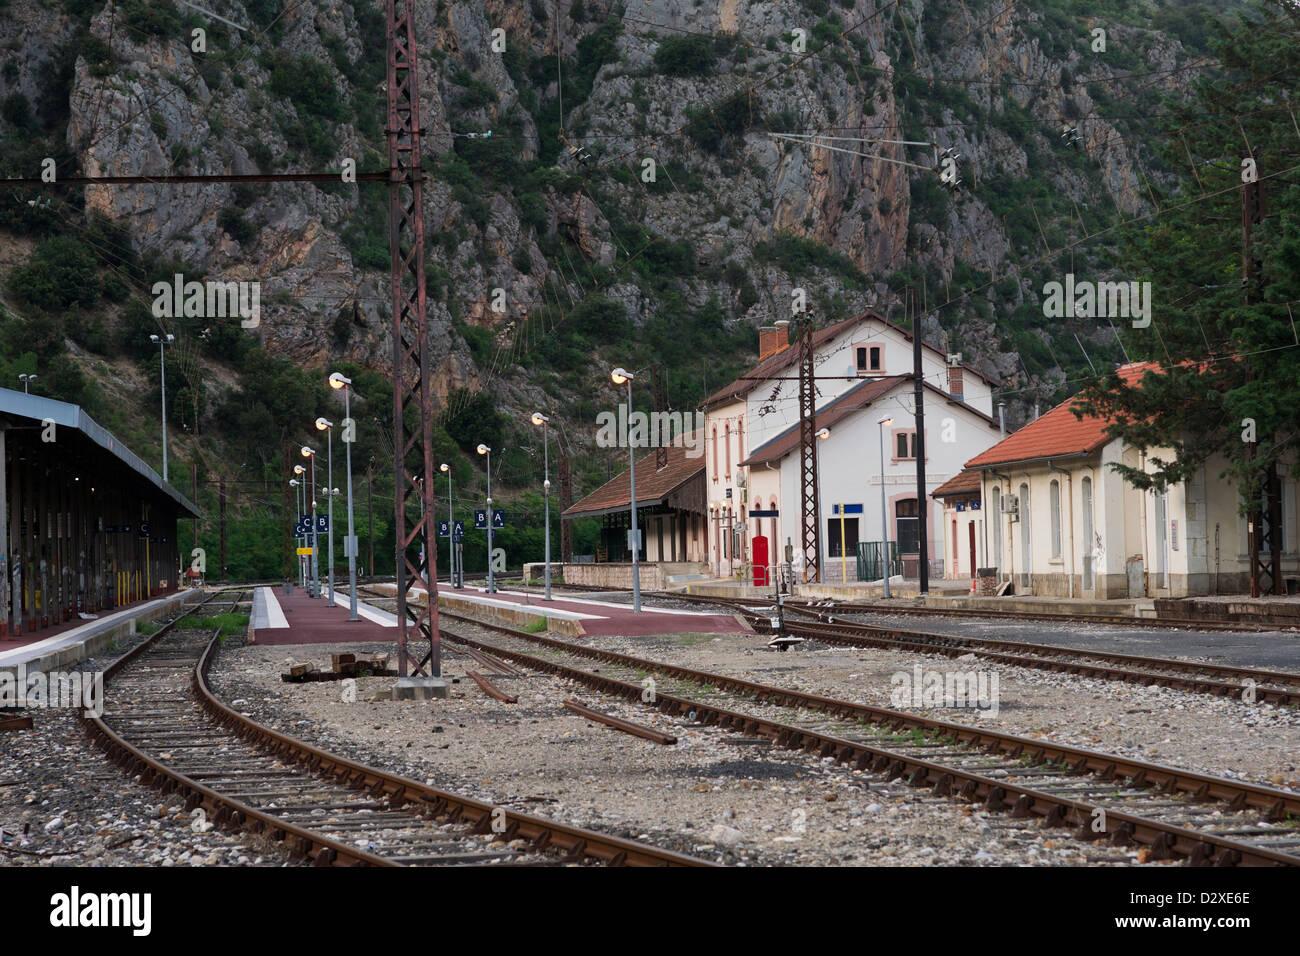 Railway station of Villefranche-de-Conflent. Languedoc, France - Stock Image